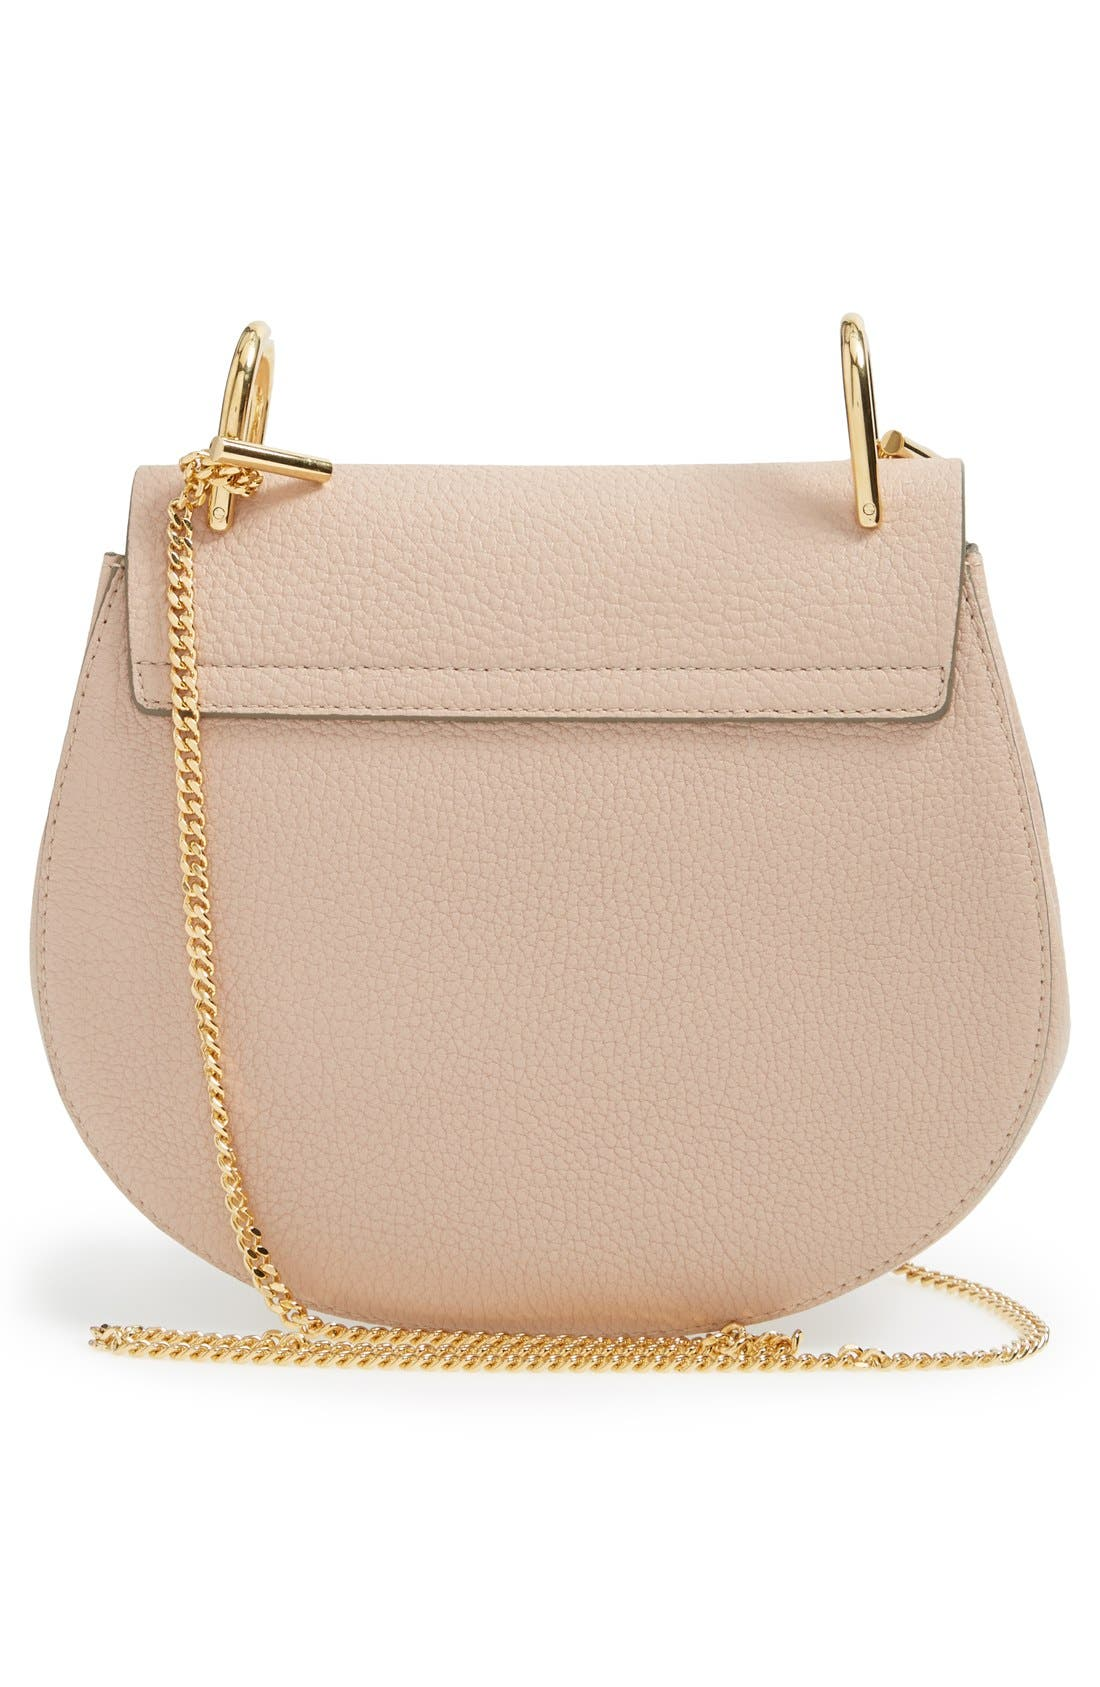 CHLOÉ, Drew Leather Shoulder Bag, Alternate thumbnail 4, color, 650